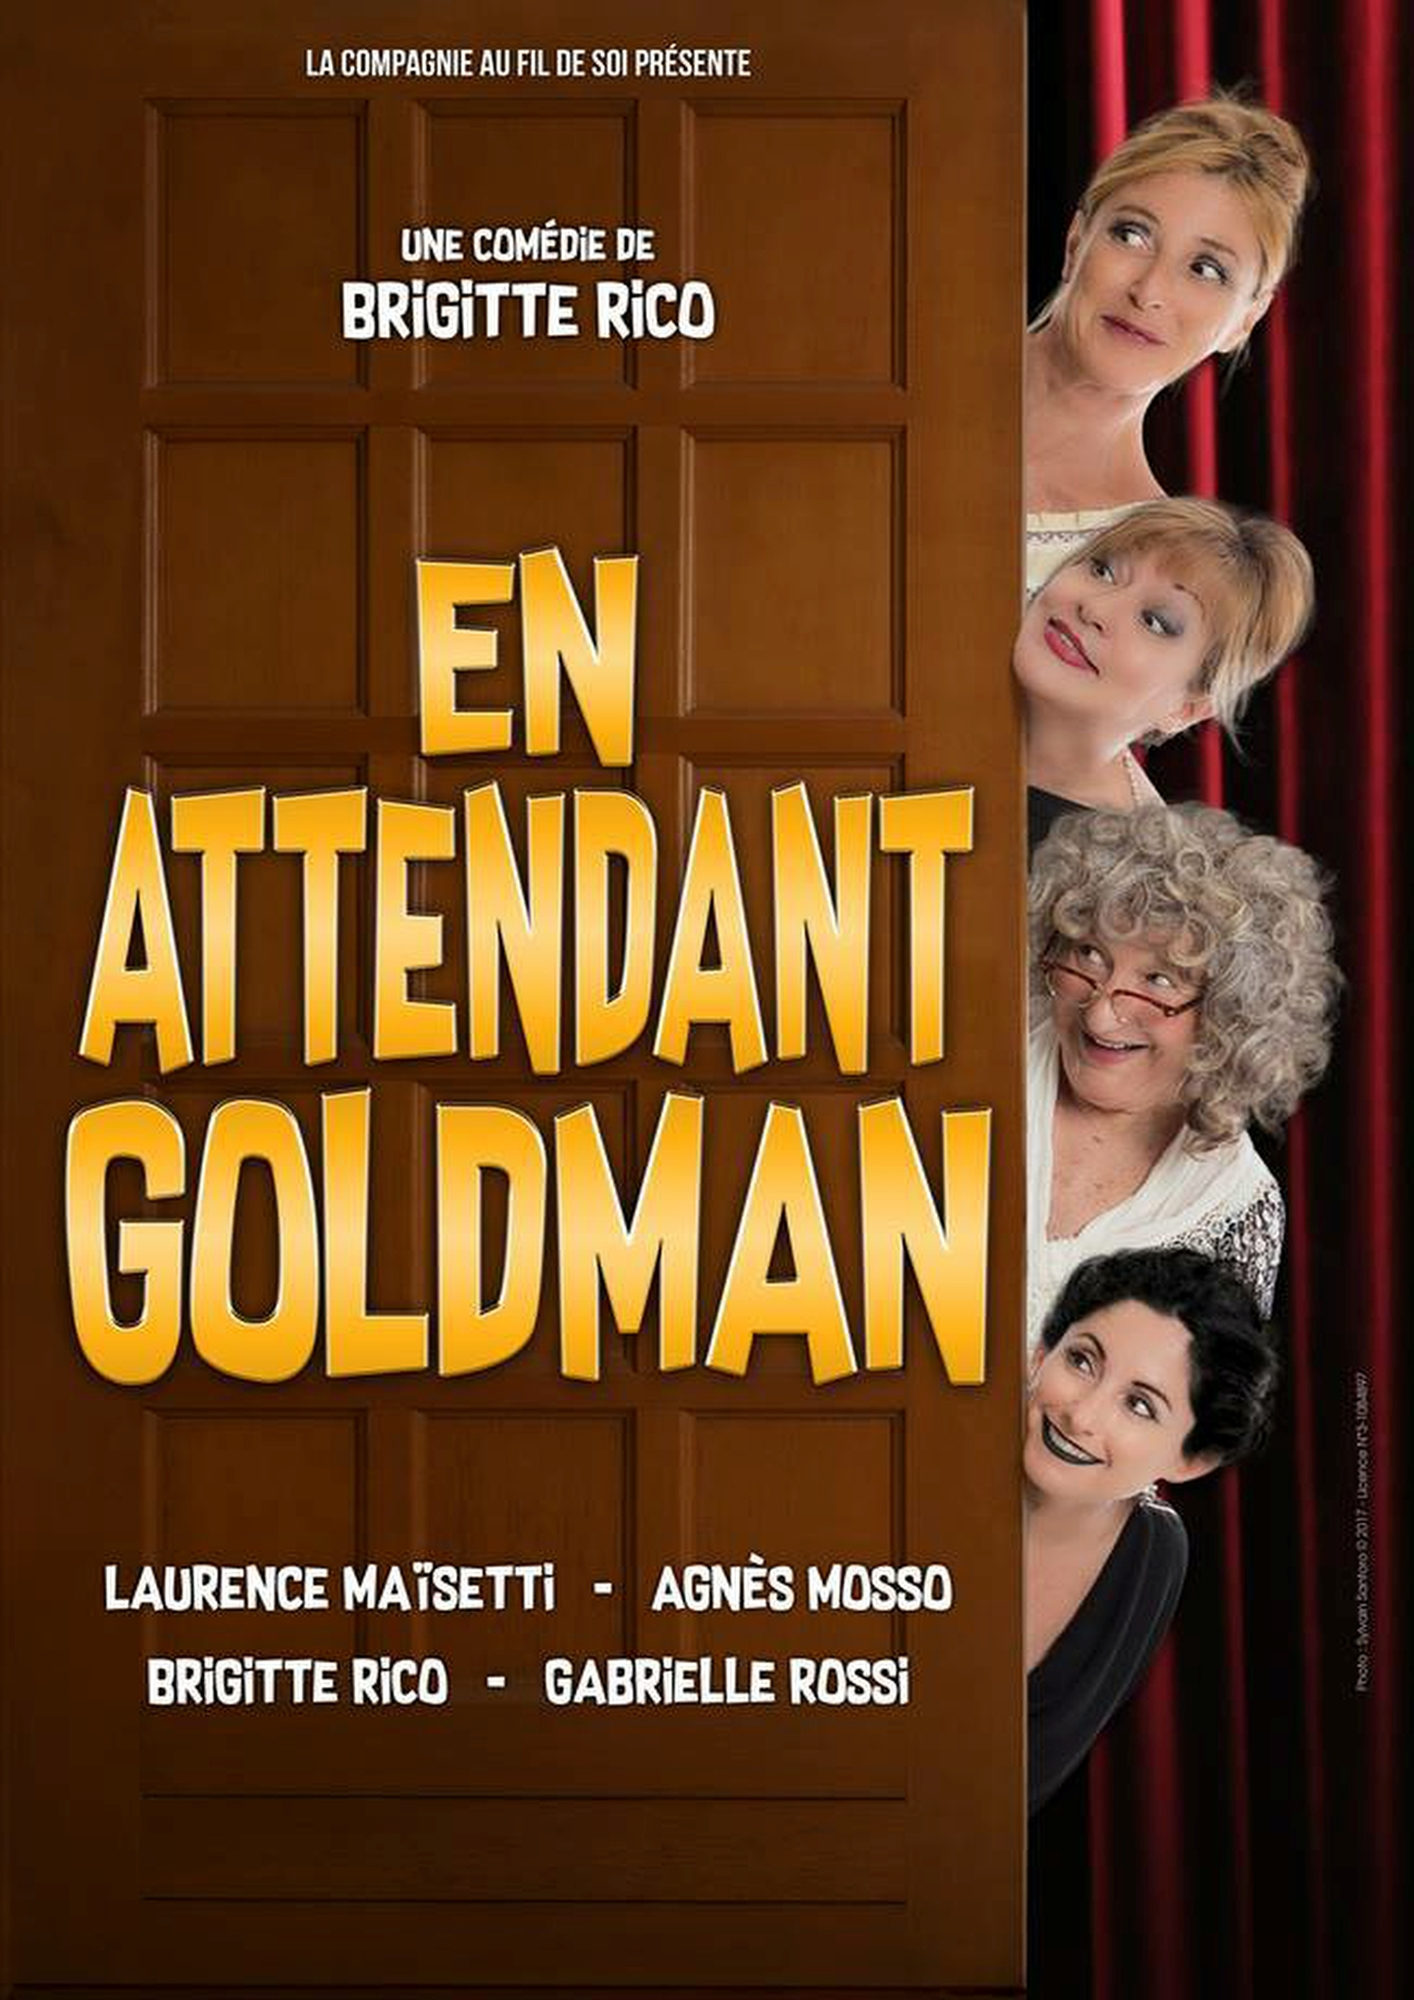 EN ATTENDANT GOLDMAN, DE BRIGITTE RICO NICE